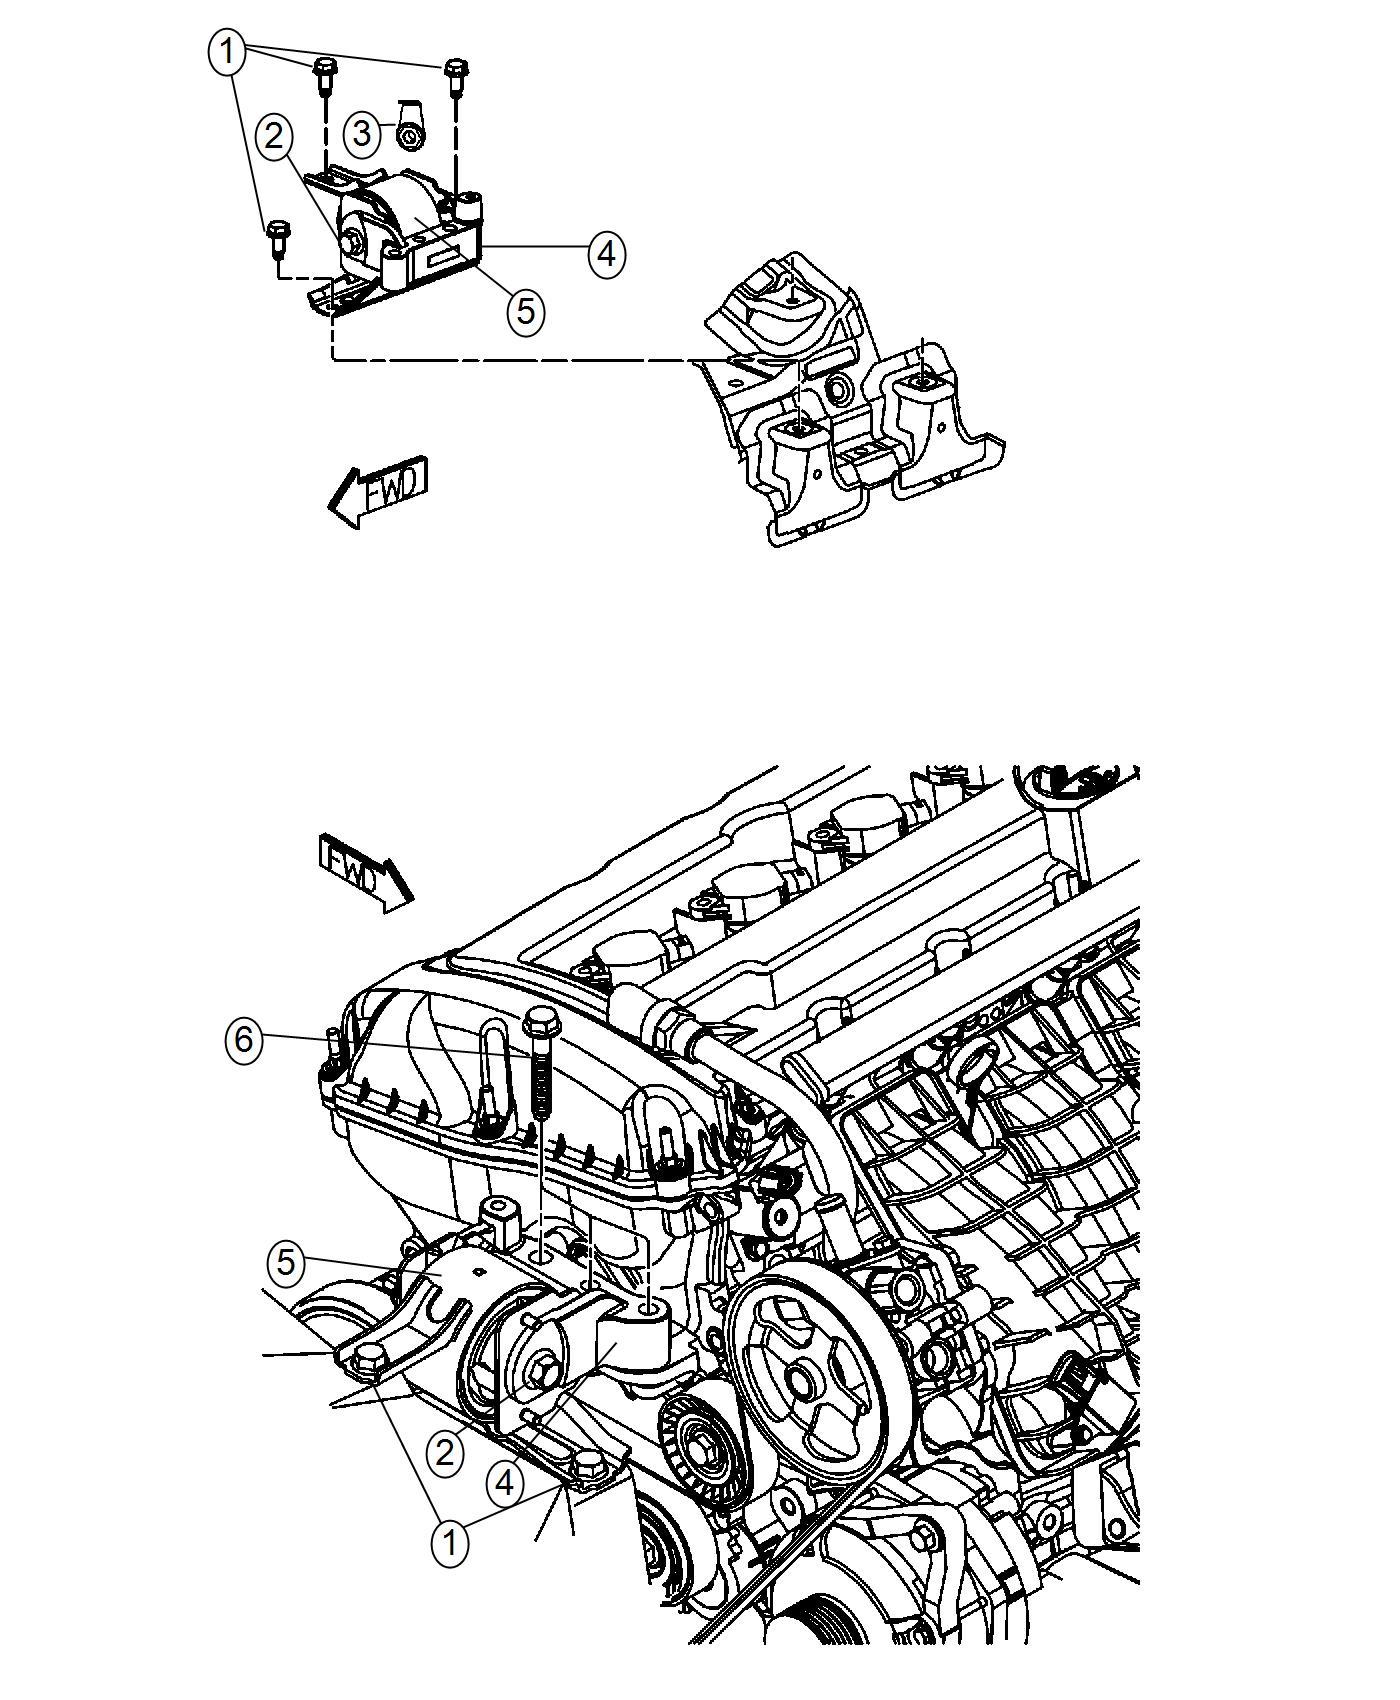 2016 Jeep Compass Bracket, bracket package. Engine mount